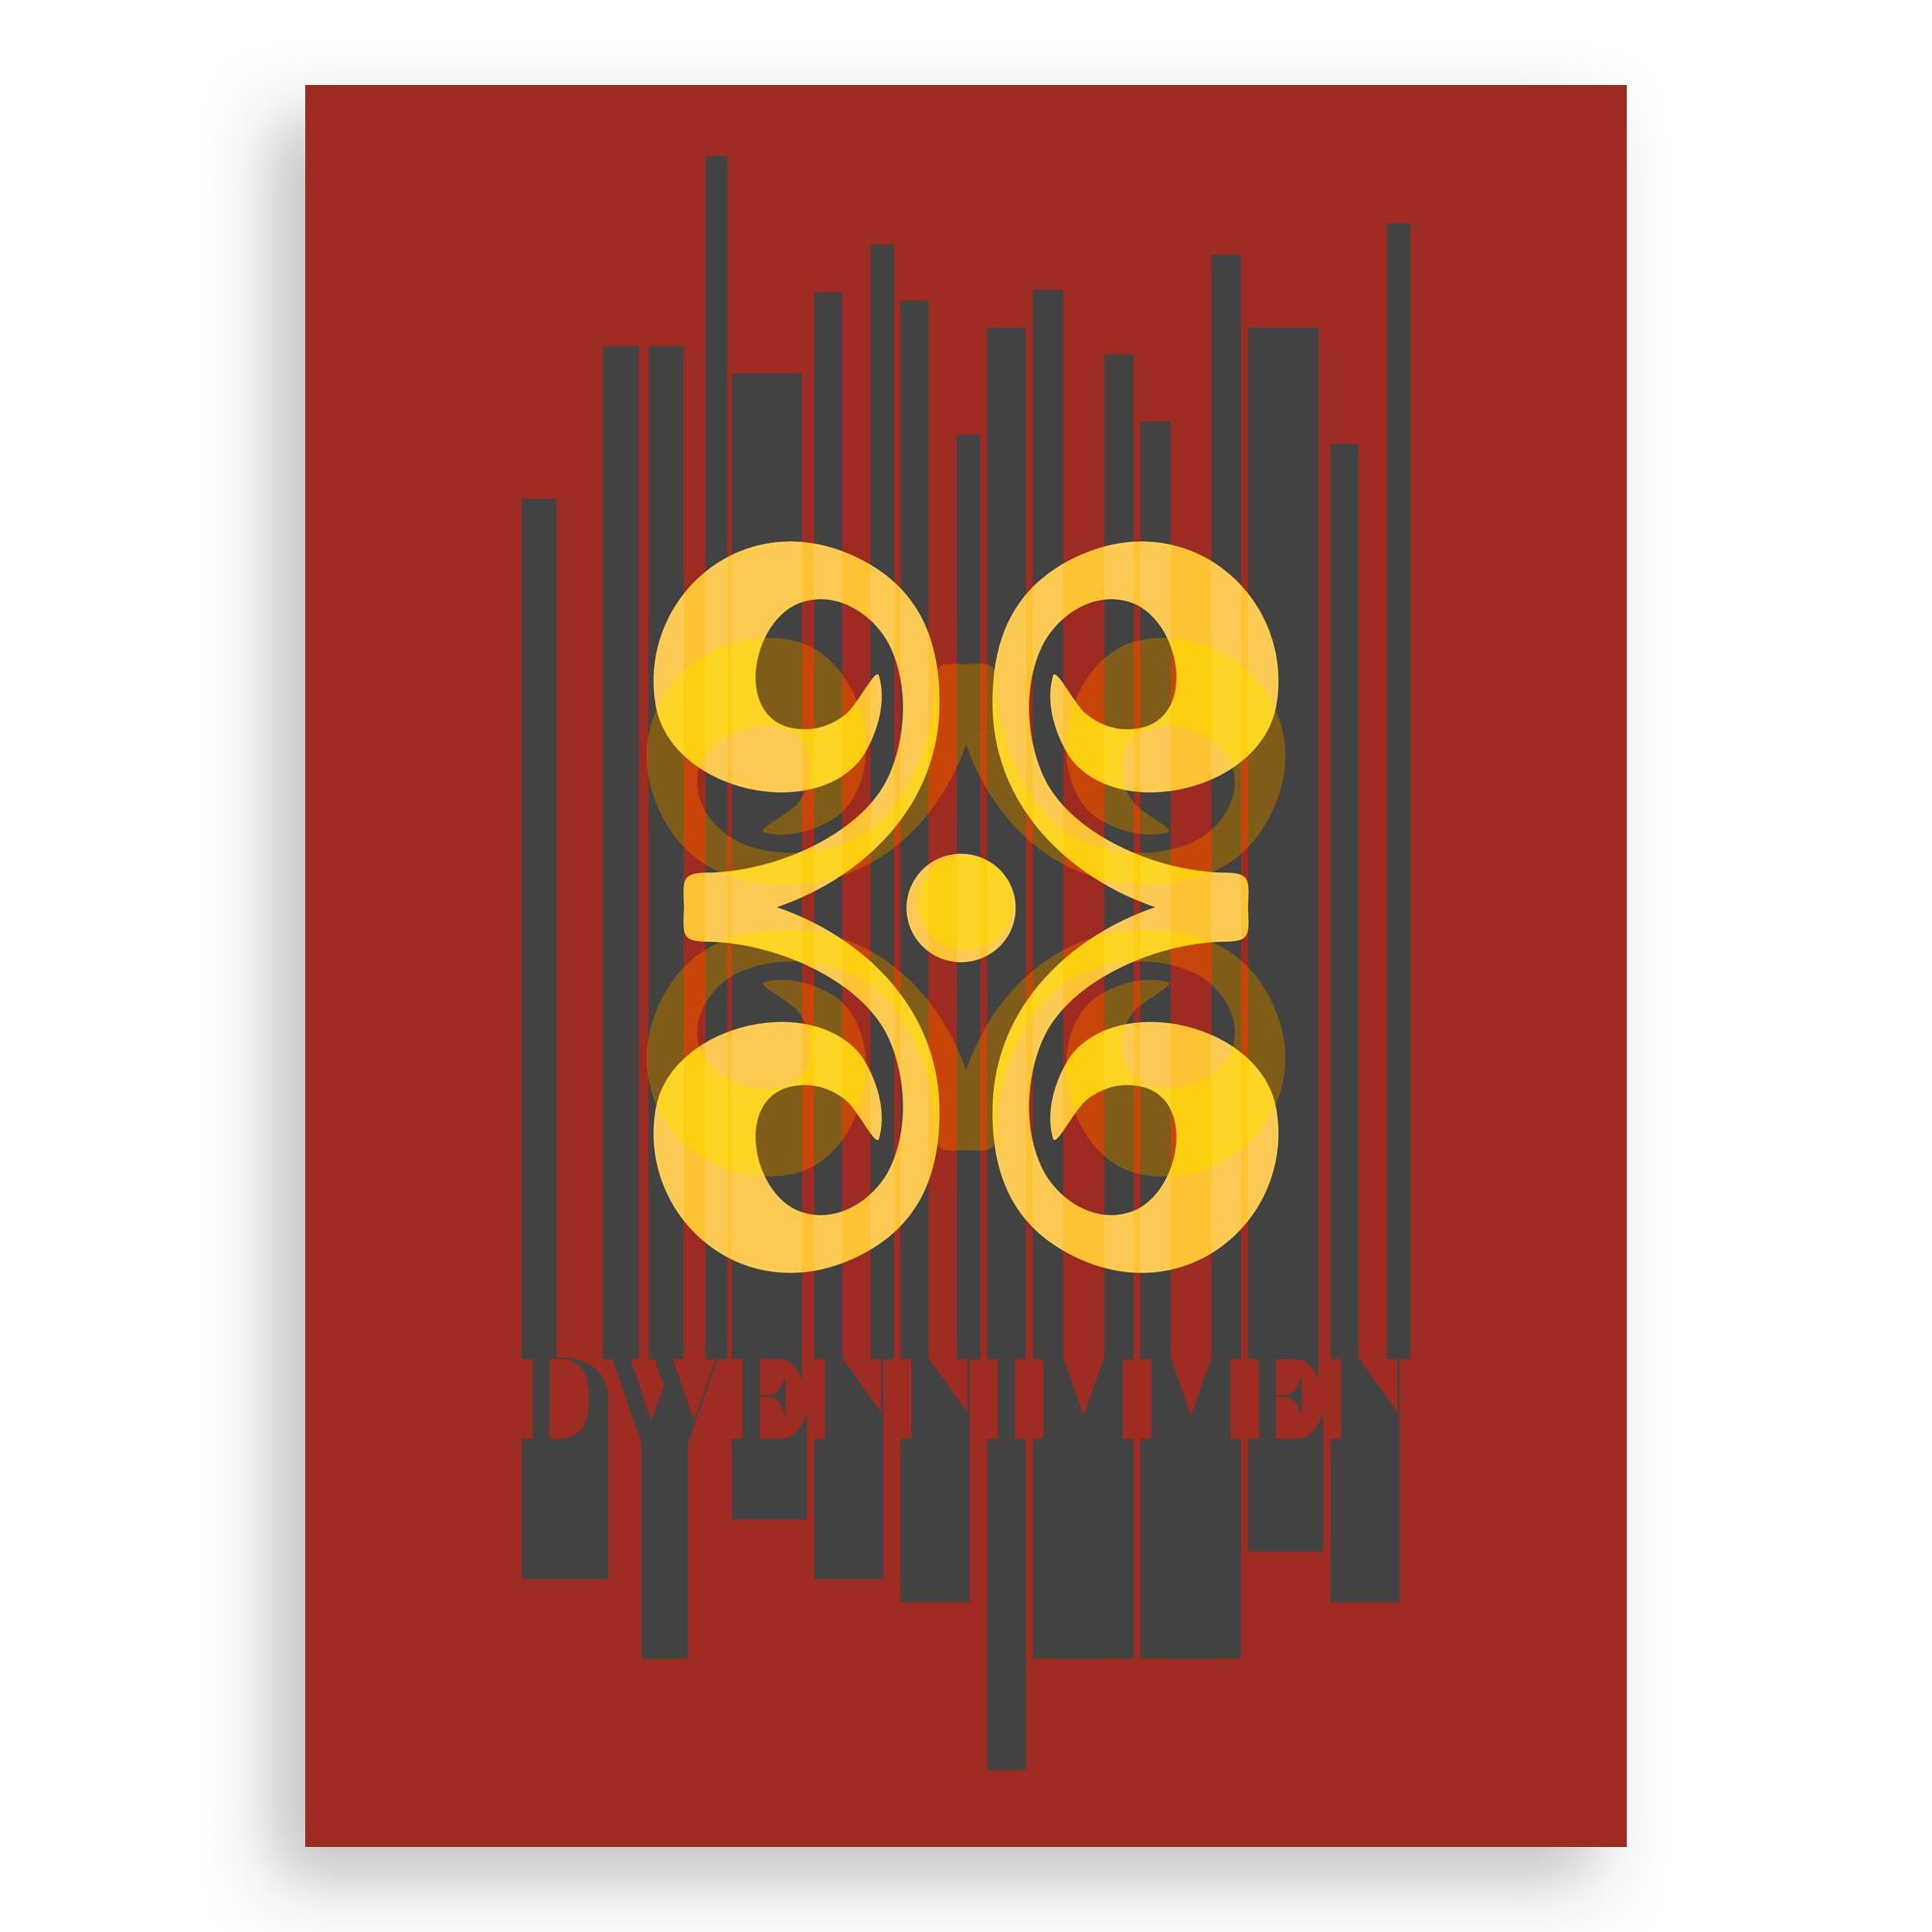 Inspirational Graphic Print – Dwennimmen (Strength)